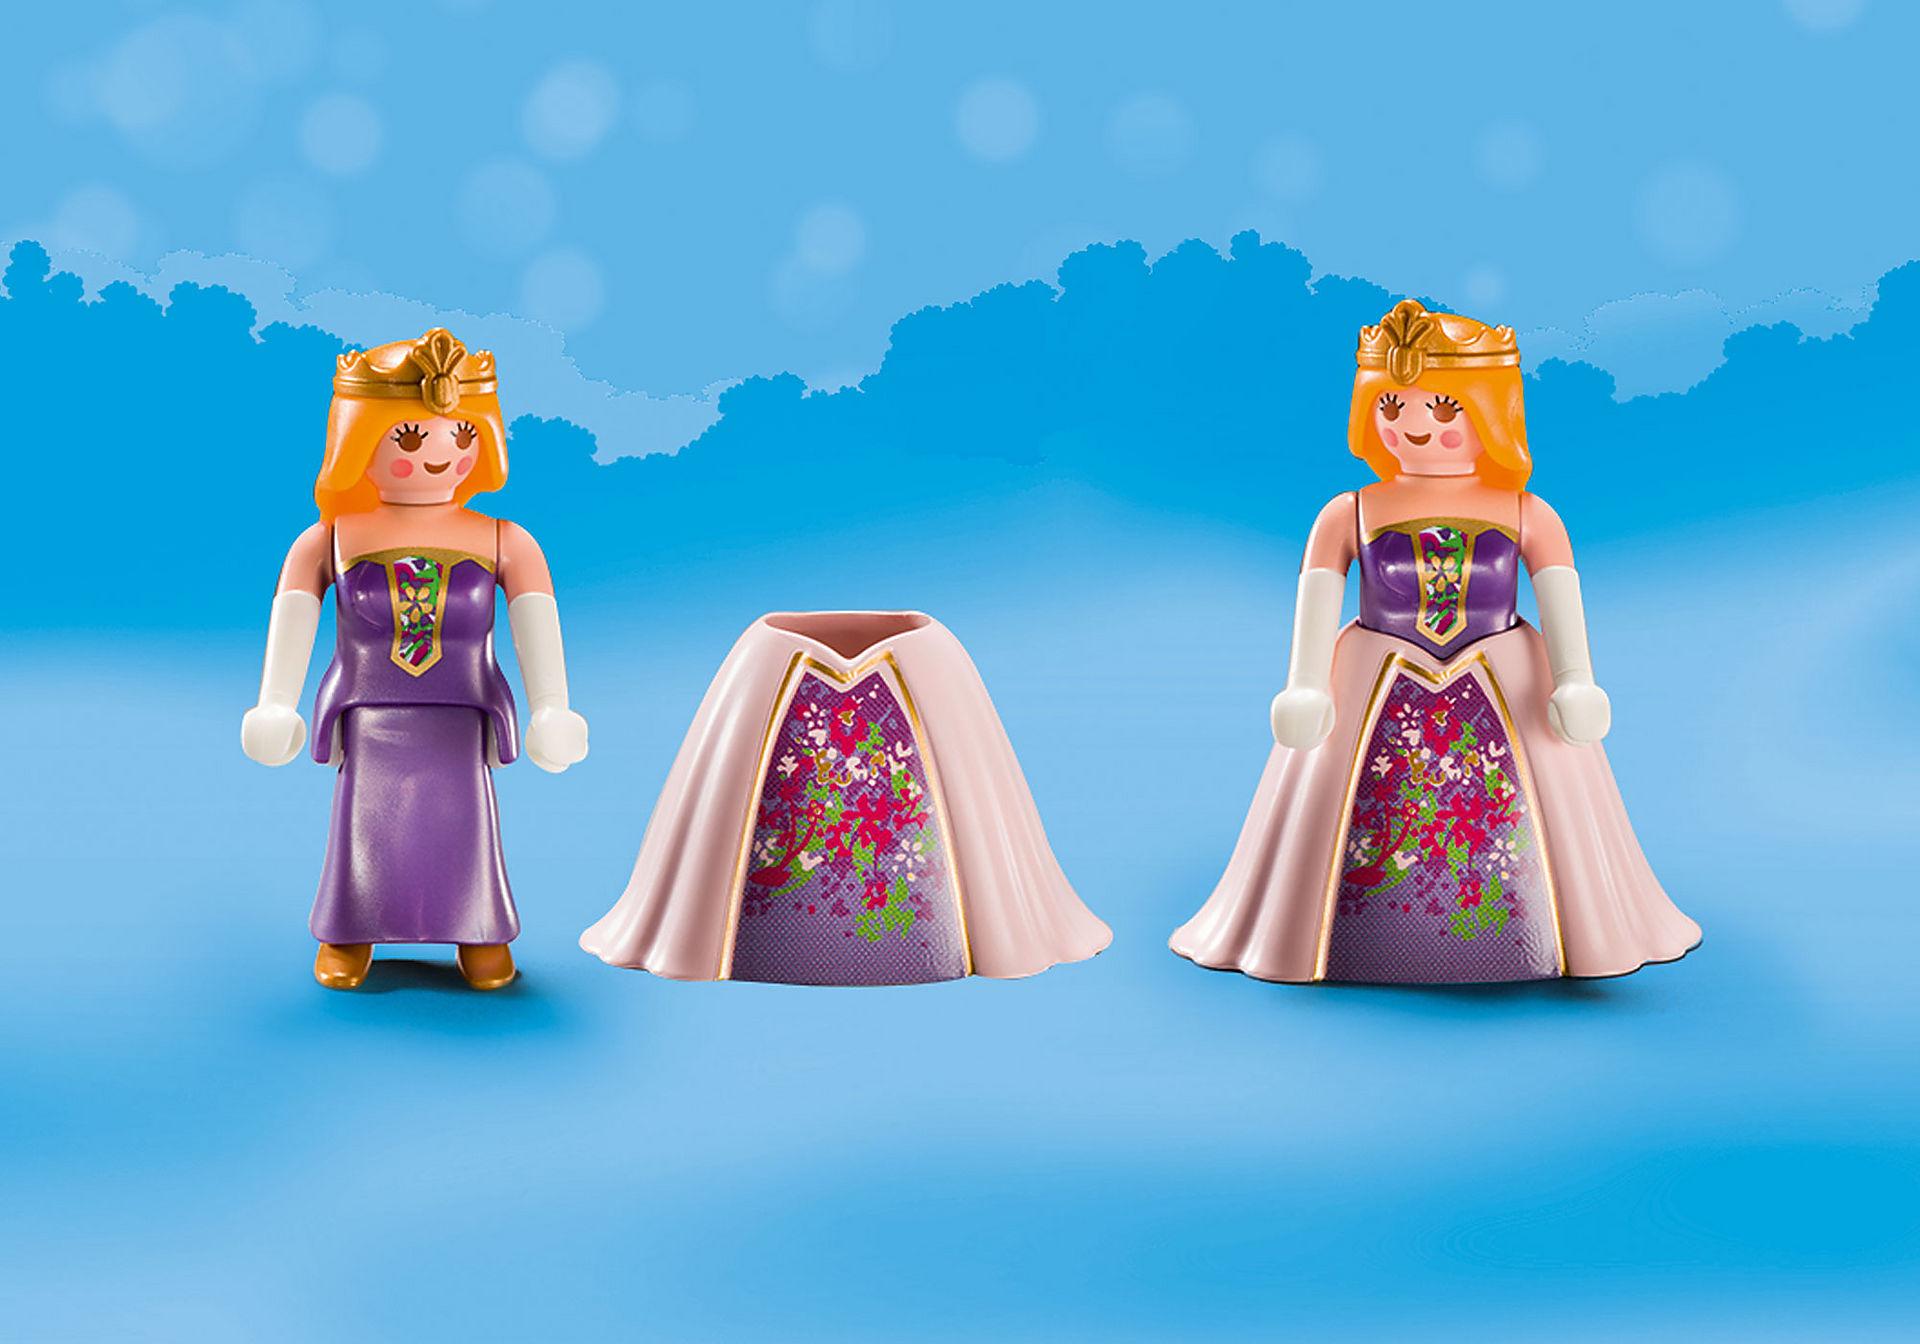 70107 Maleta grande Princesas e Unicórnio zoom image4